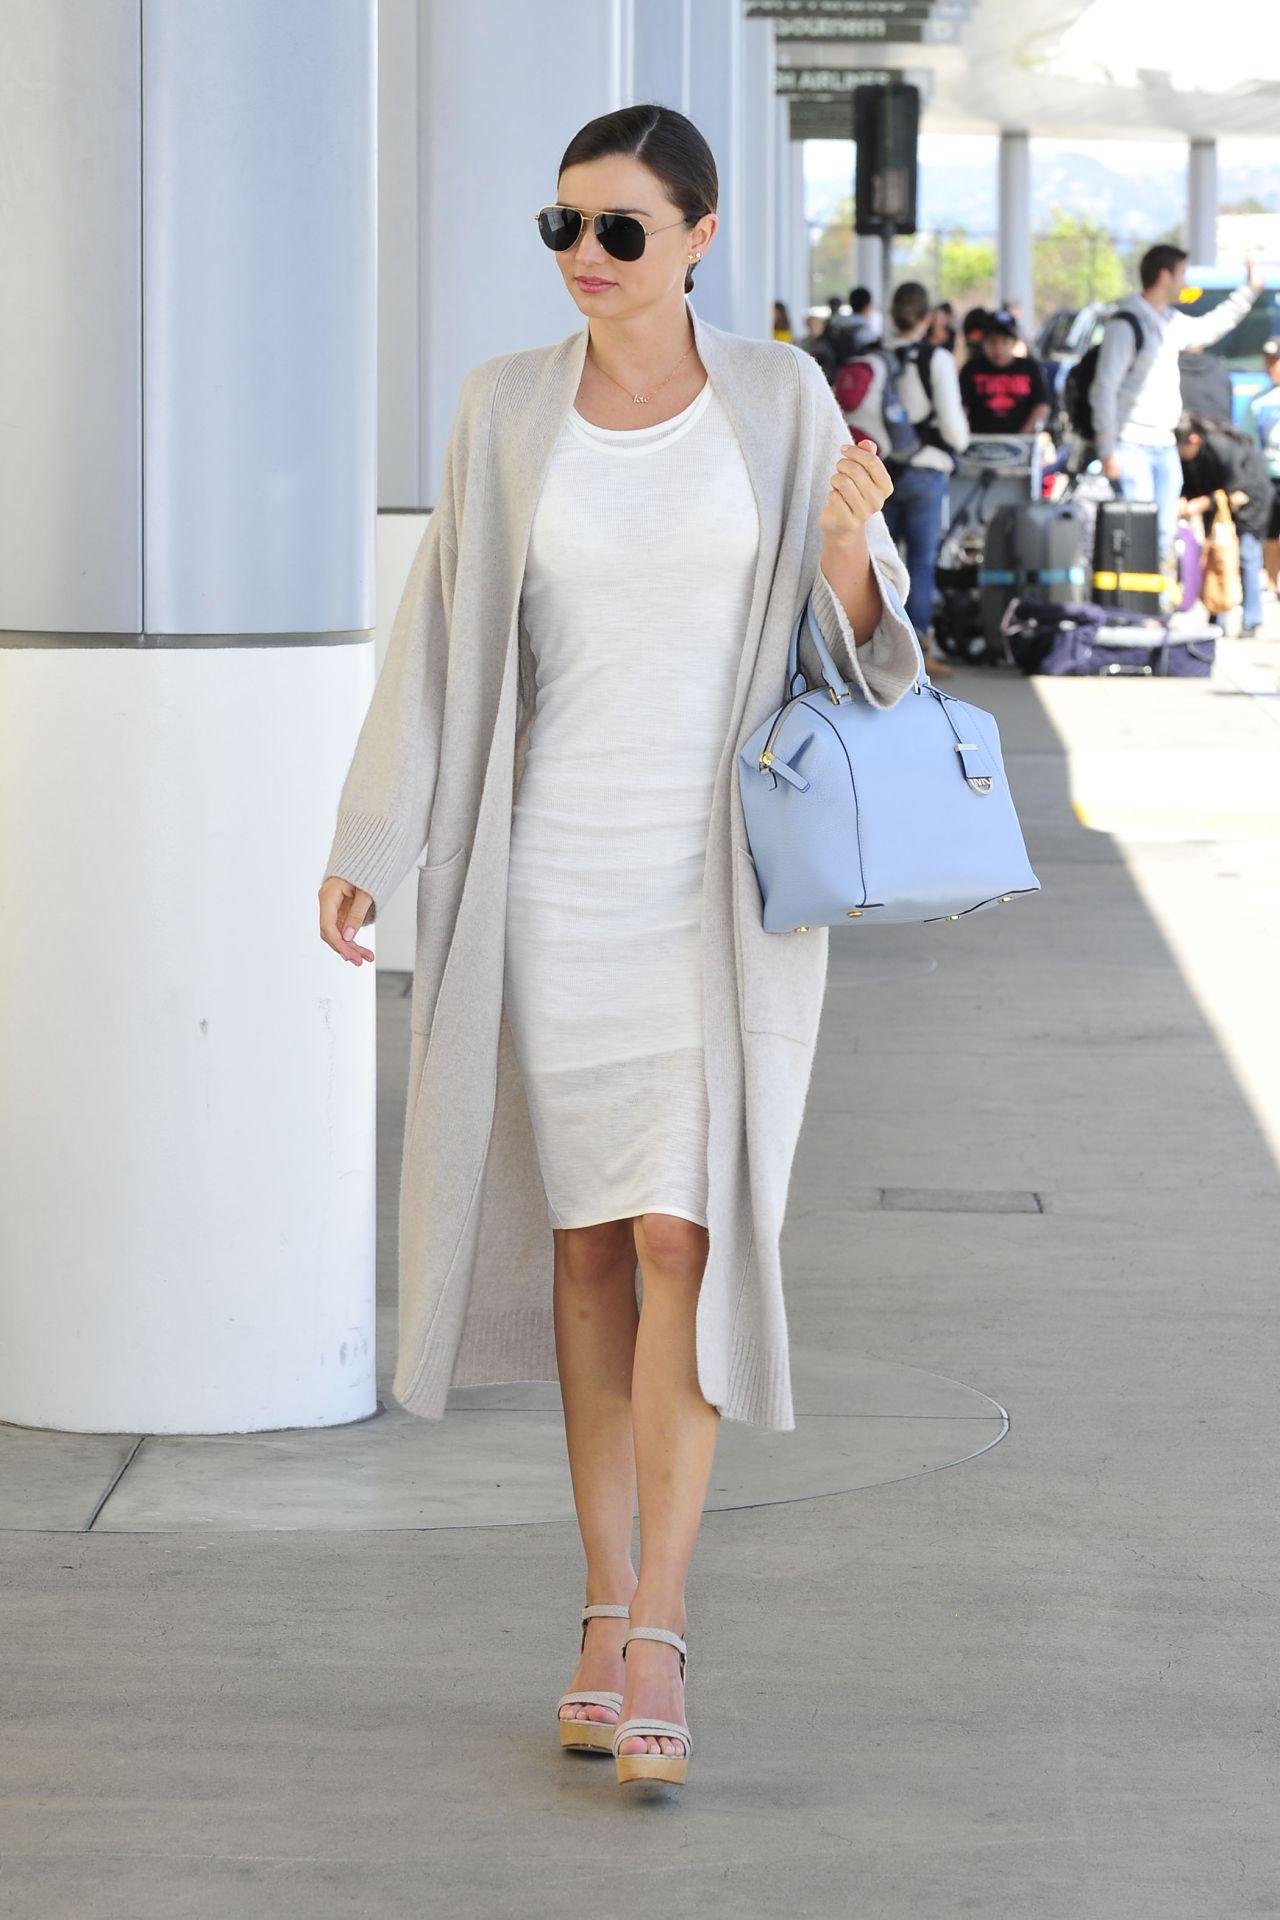 Miranda Kerr Fashion Style - at LAX Airport, April 2015